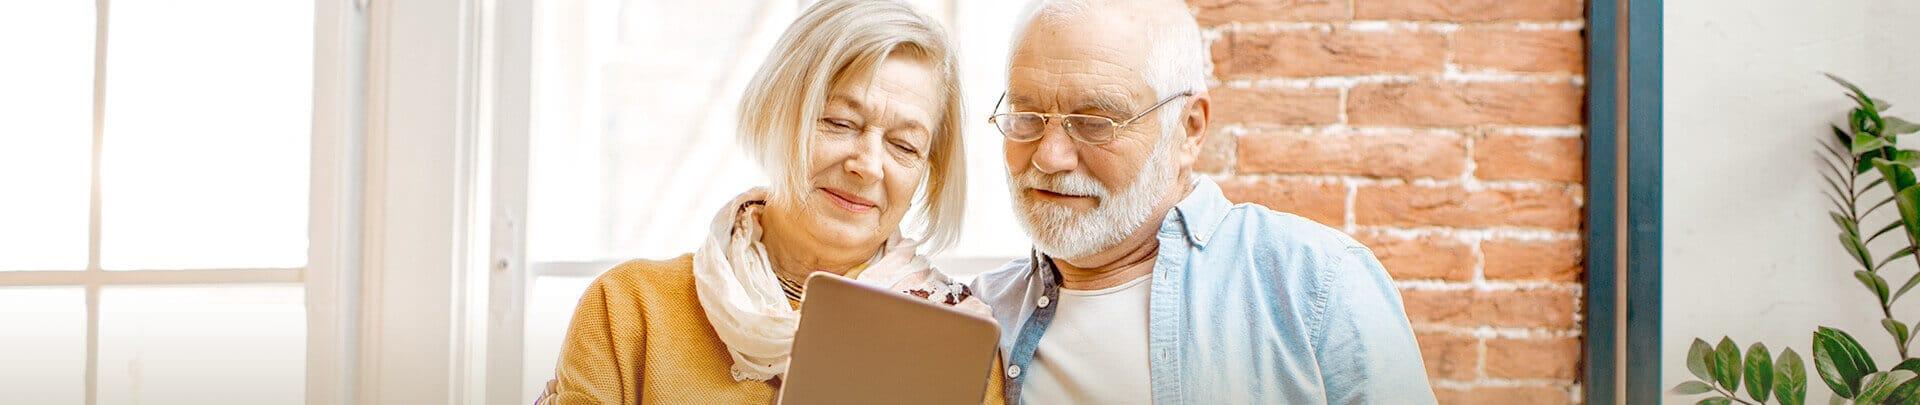 Seniorenpaar